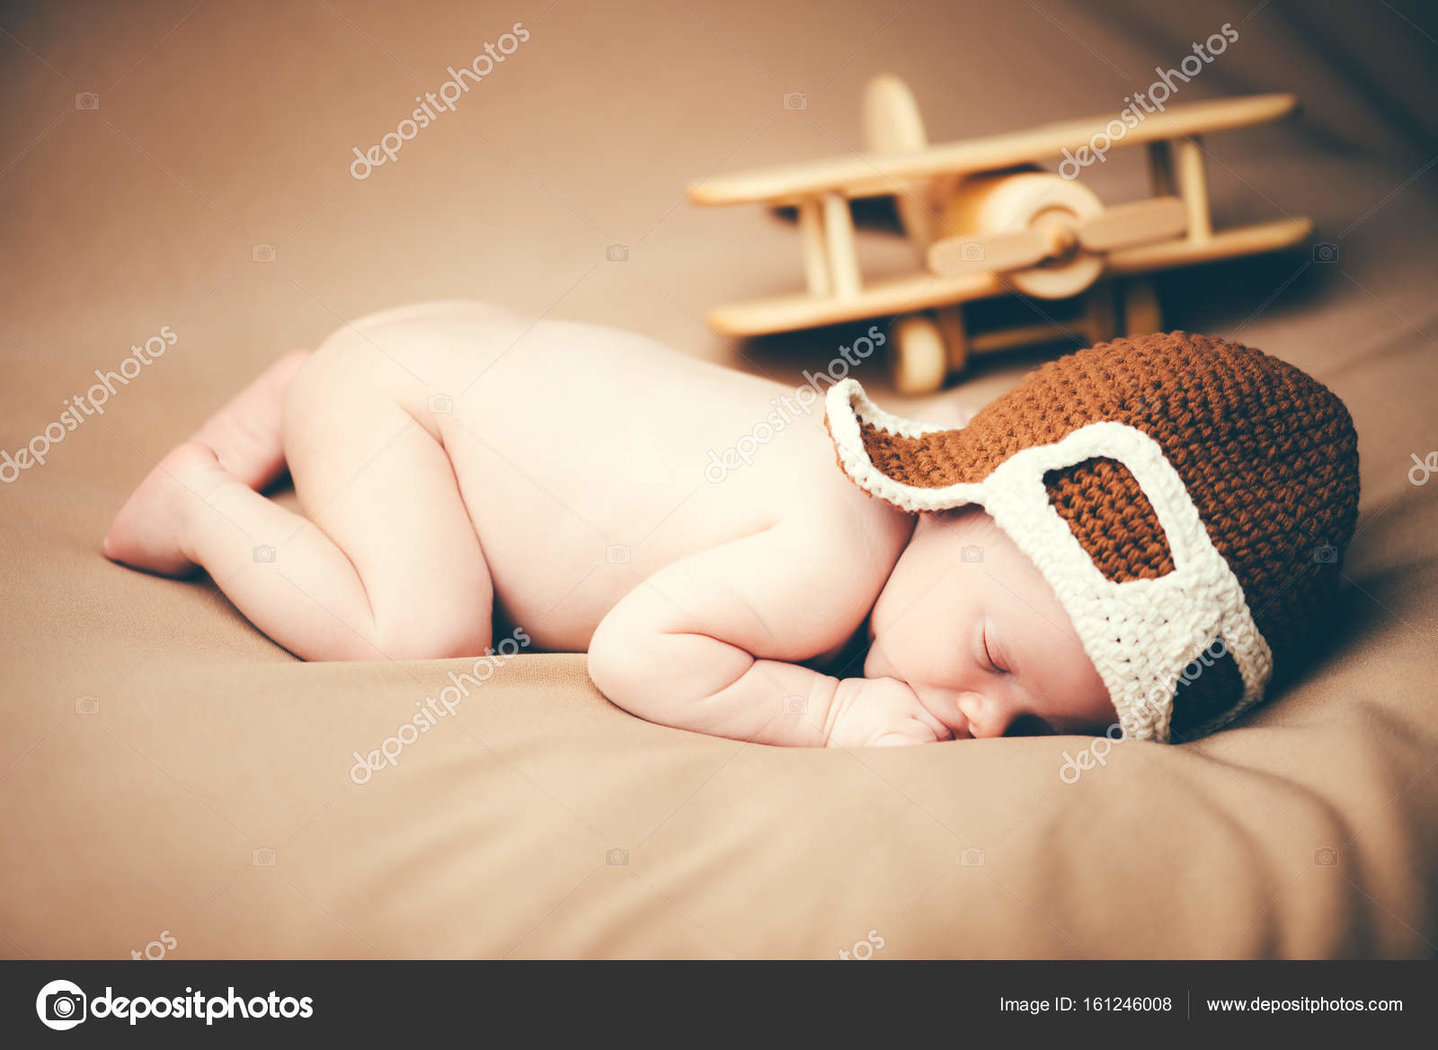 depositphotos_161246008-stock-photo-small-baby-pilot[1].jpg